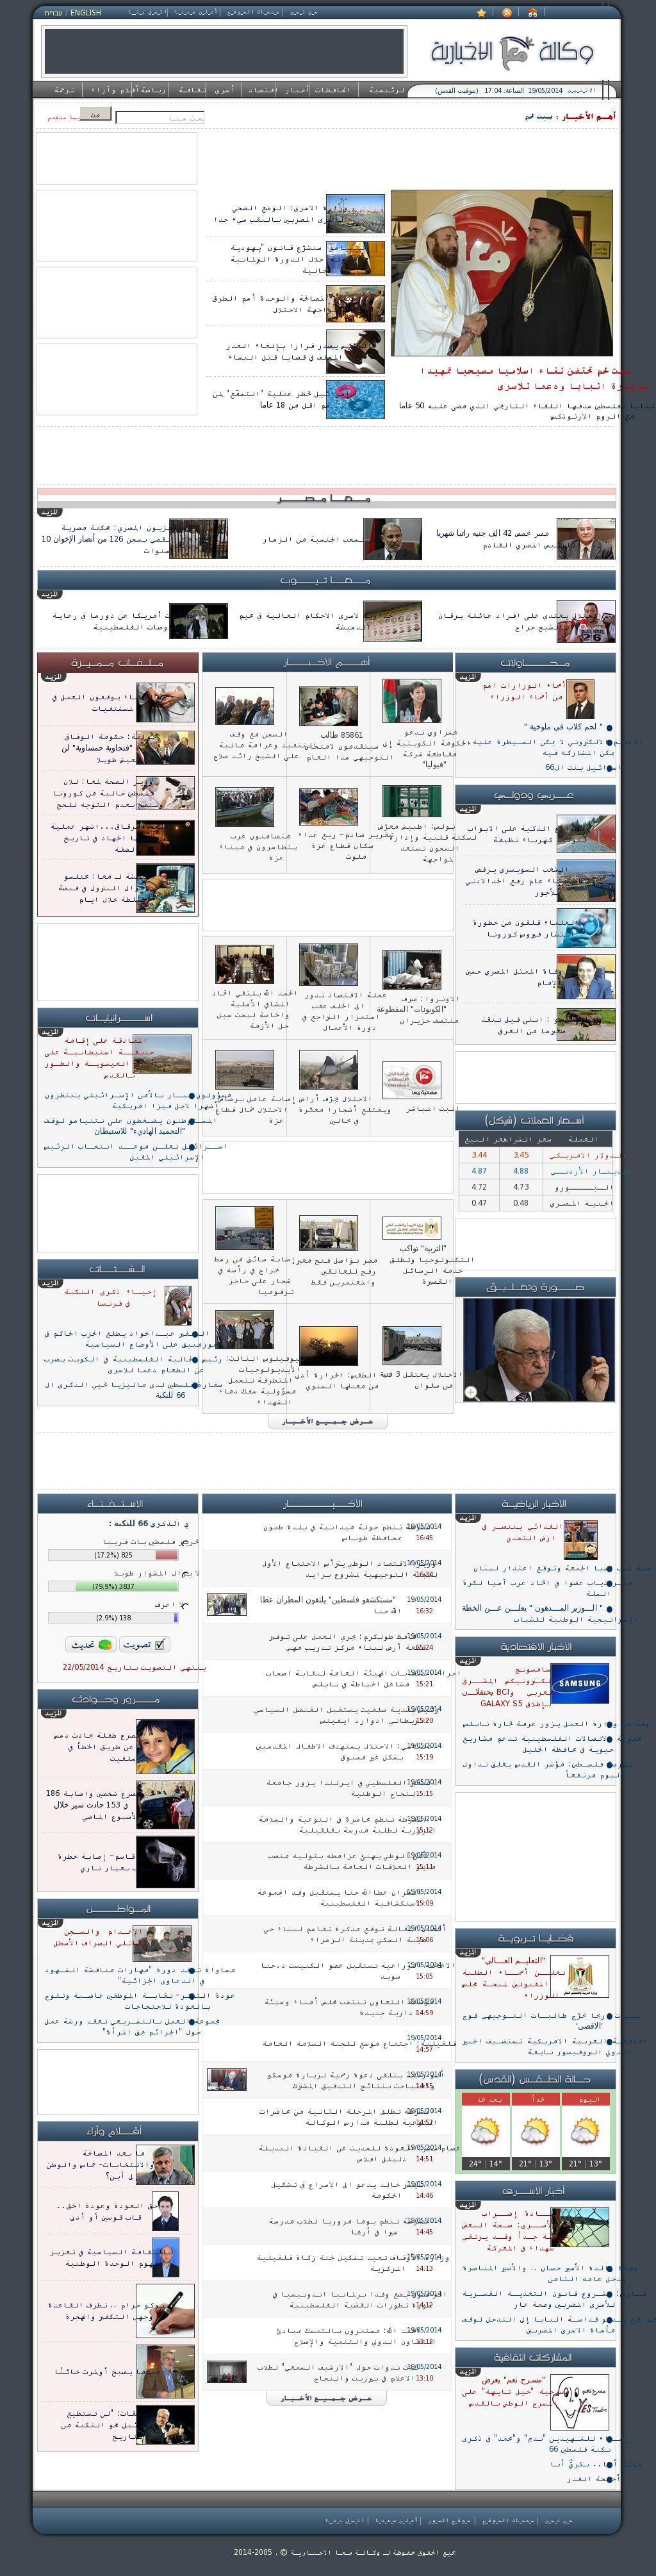 Ma'an News at Monday May 19, 2014, 2:08 p.m. UTC